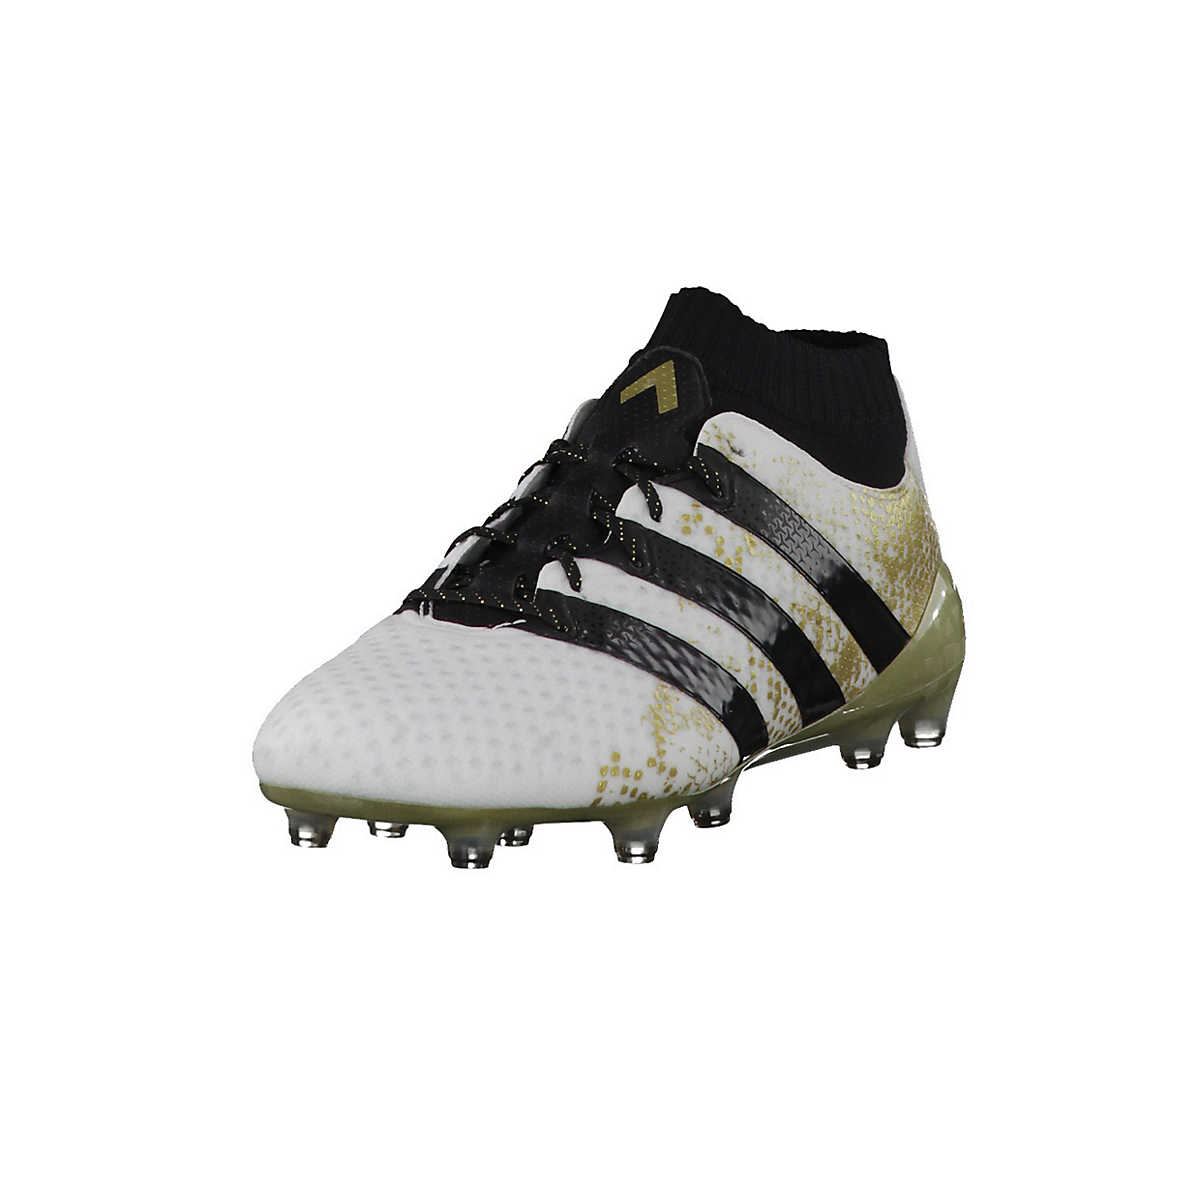 adidas Sportschuhe gold - adidas - Sportschuhe - Schuhe - mirapodo.de